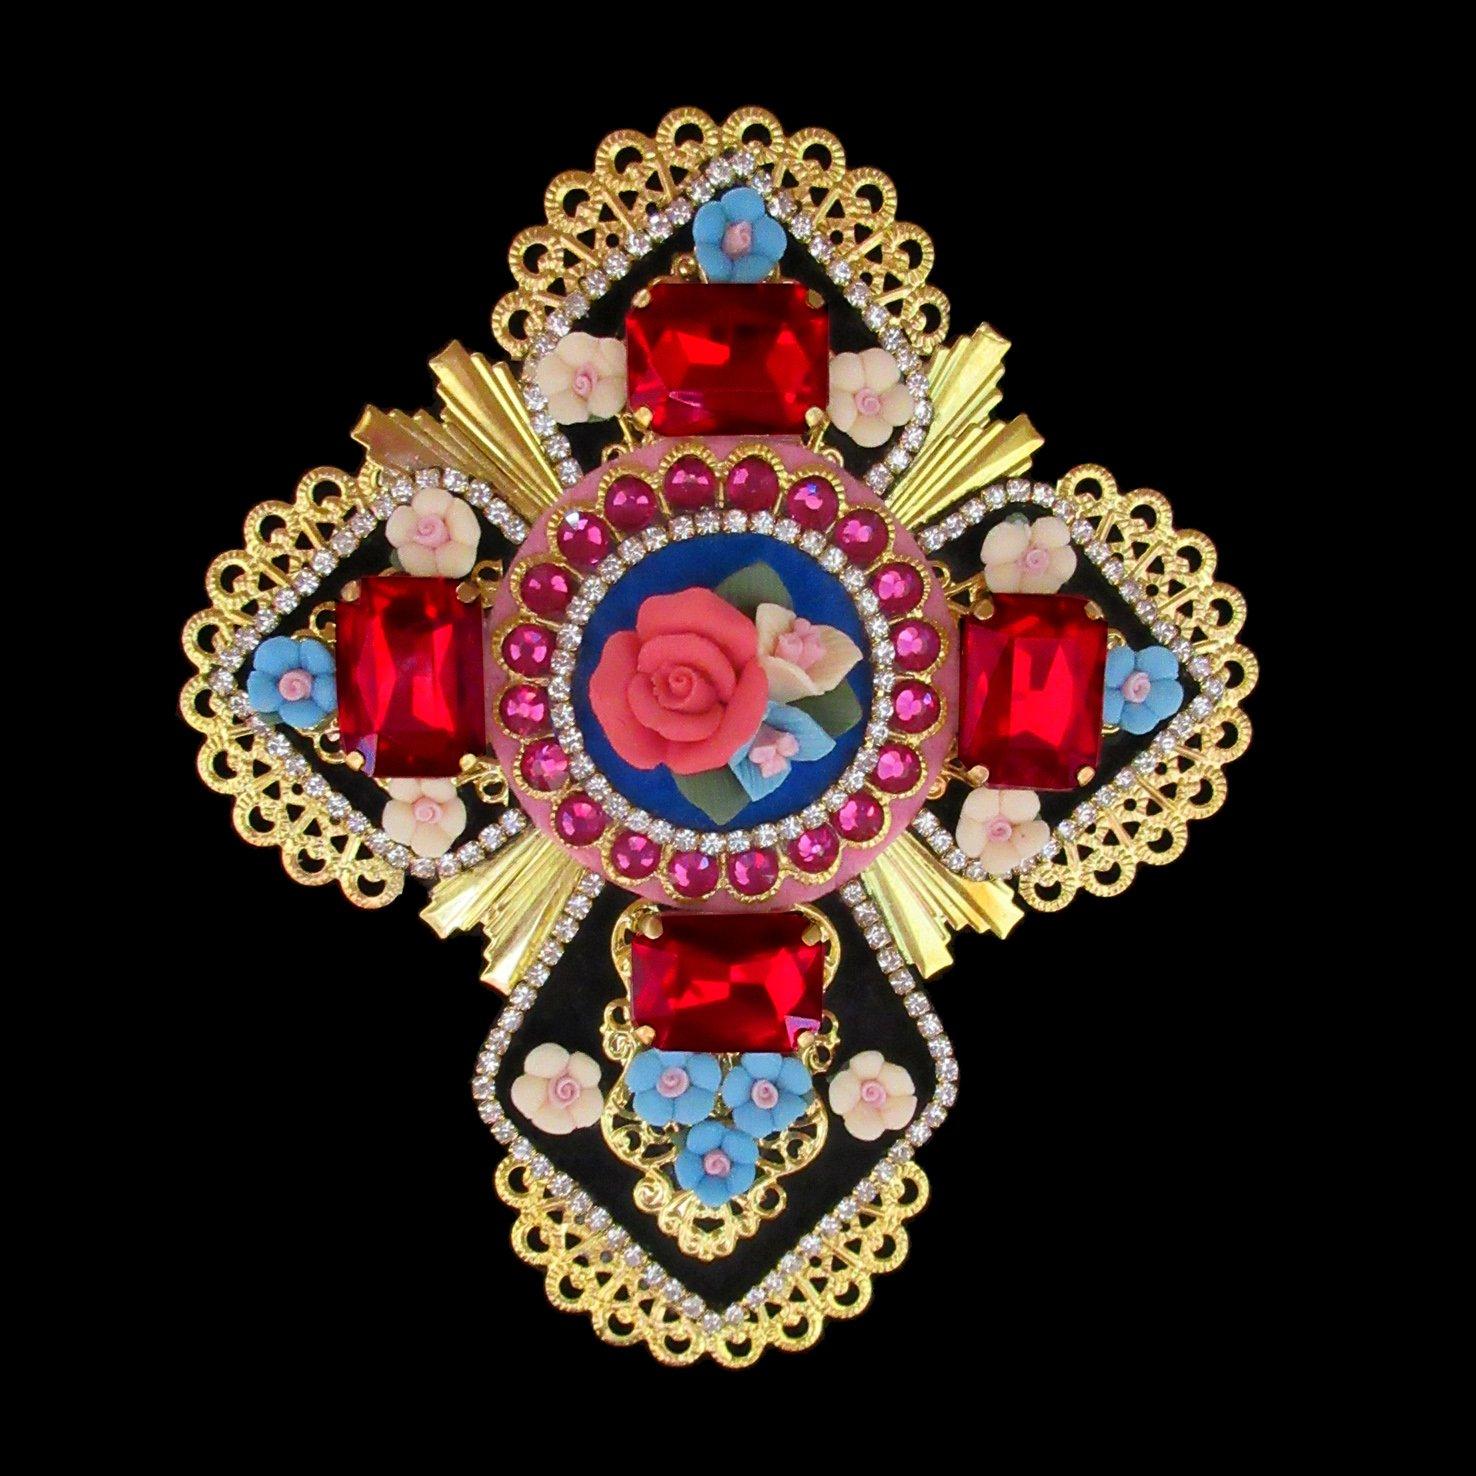 mouchkine-jewelry-brooch-cross-dolcevita-fashion-jewels-bijoux-mode-style-fashion-trend-pack.jpg